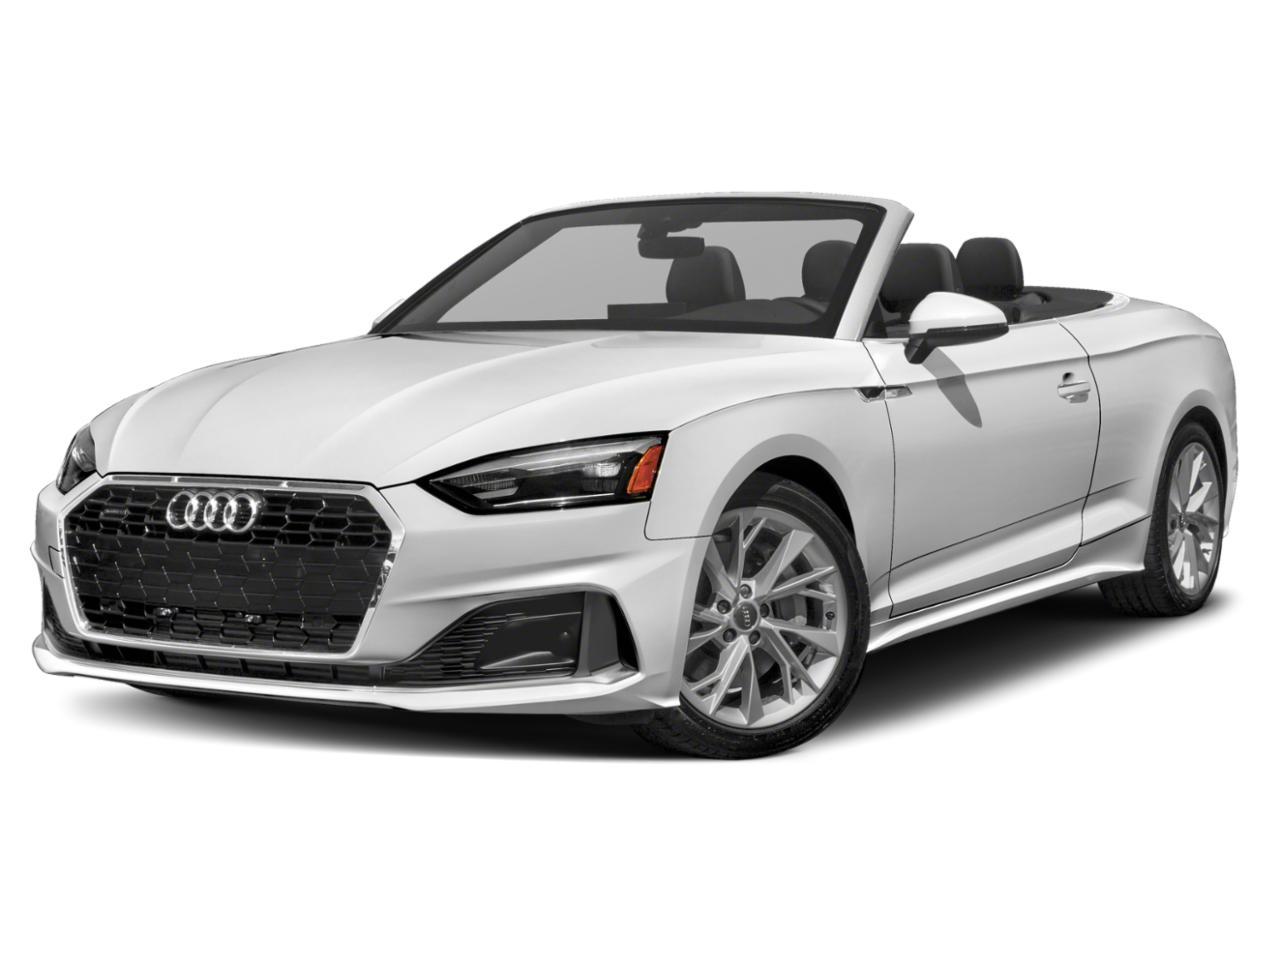 New 2020 Audi A5 Sportback Florett Silver: Car for Sale ...